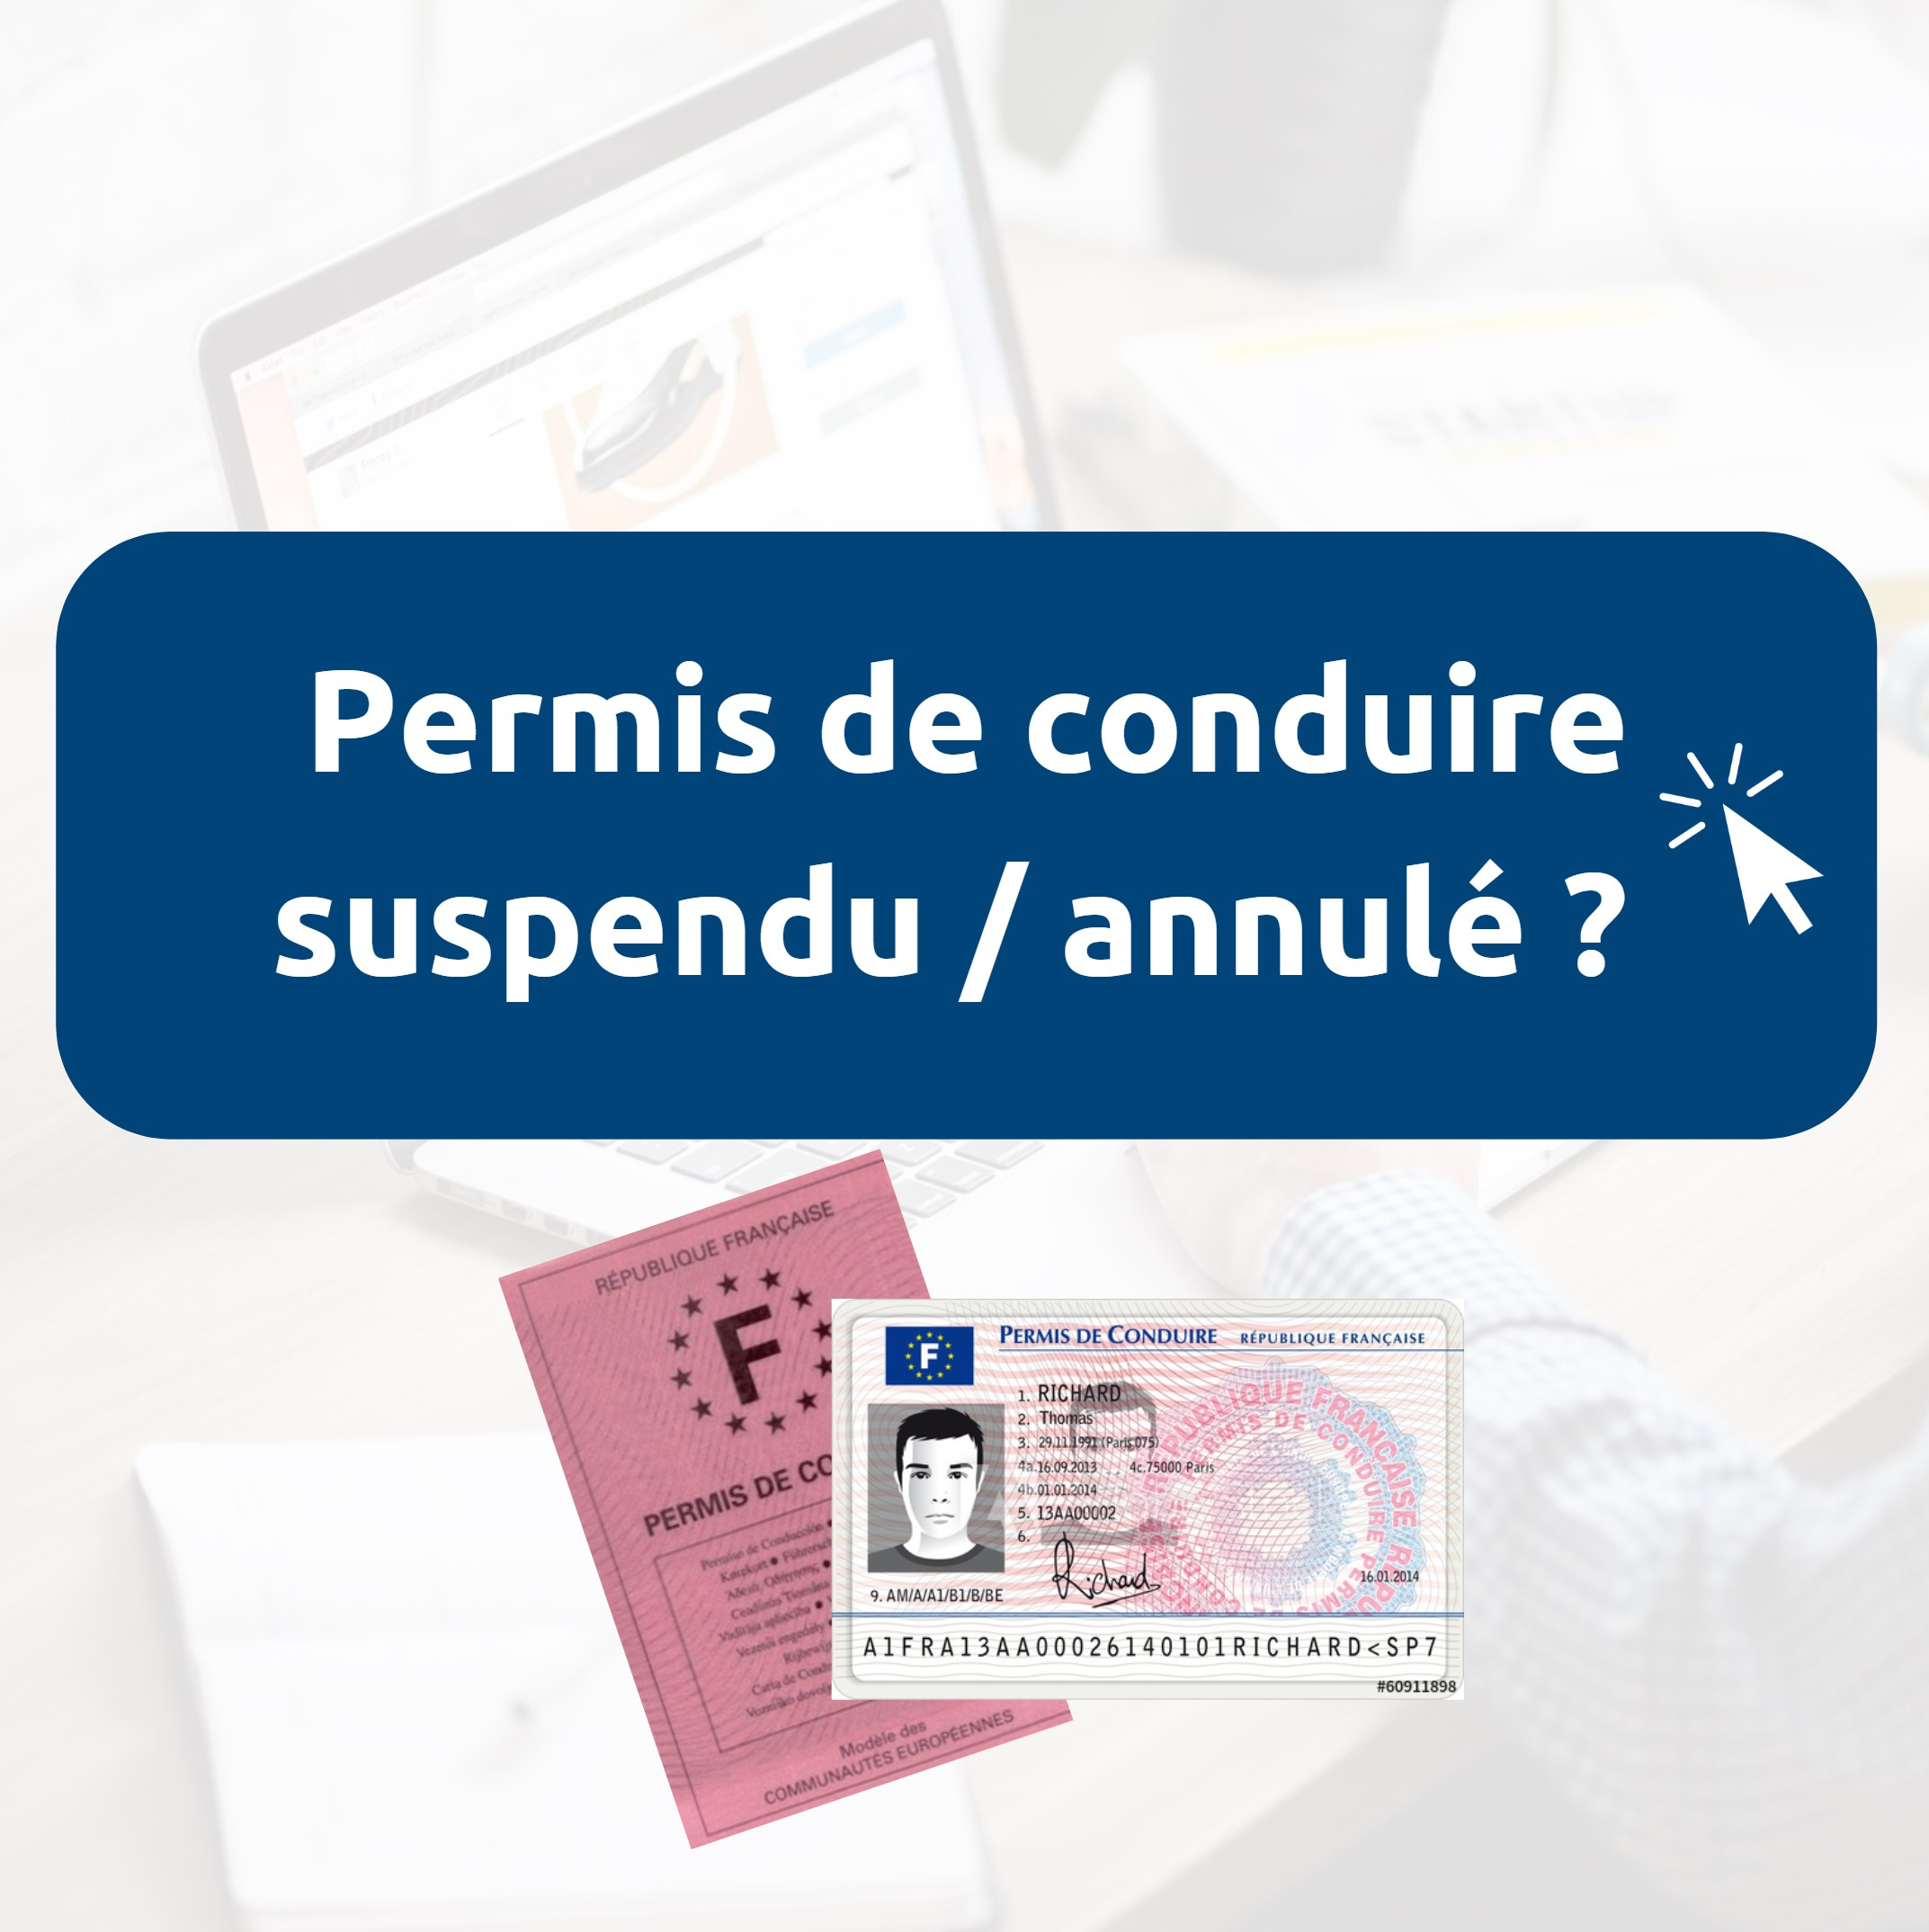 Suspension / annulation permis de conduire